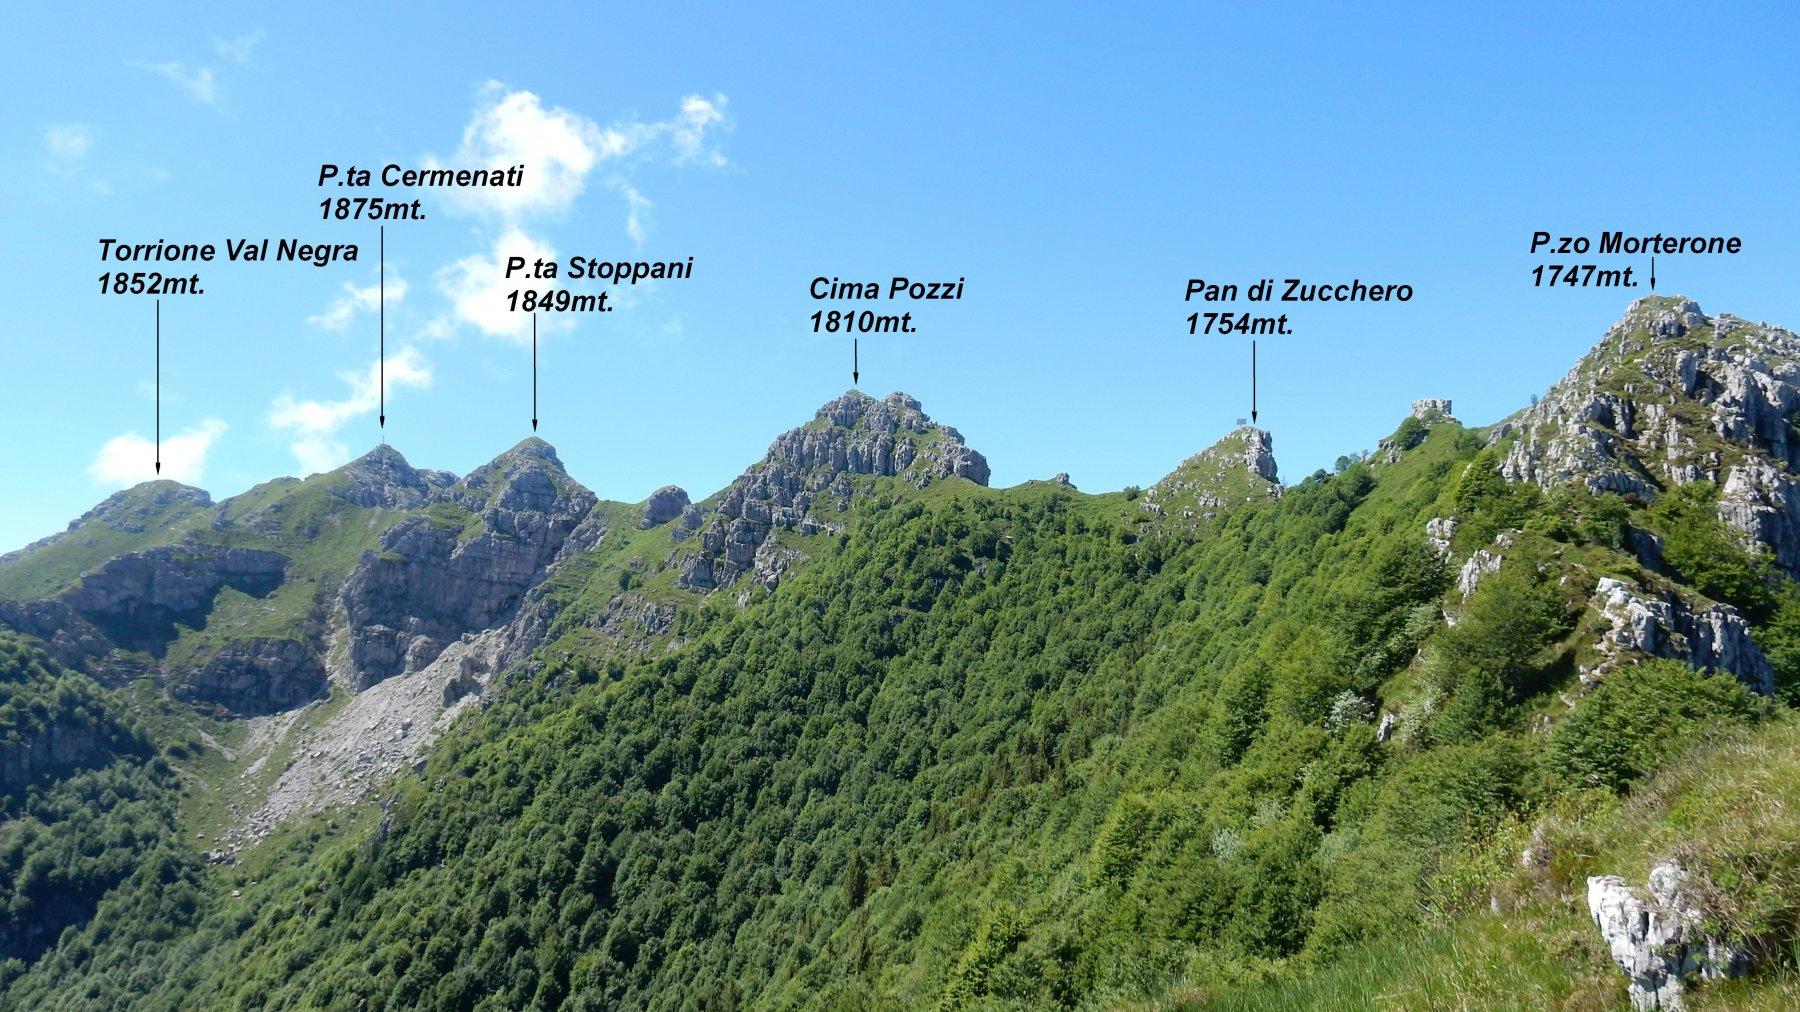 Resegone - Punta Cermenati da Brumano, traversata creste Sud-Nord 2019-06-23